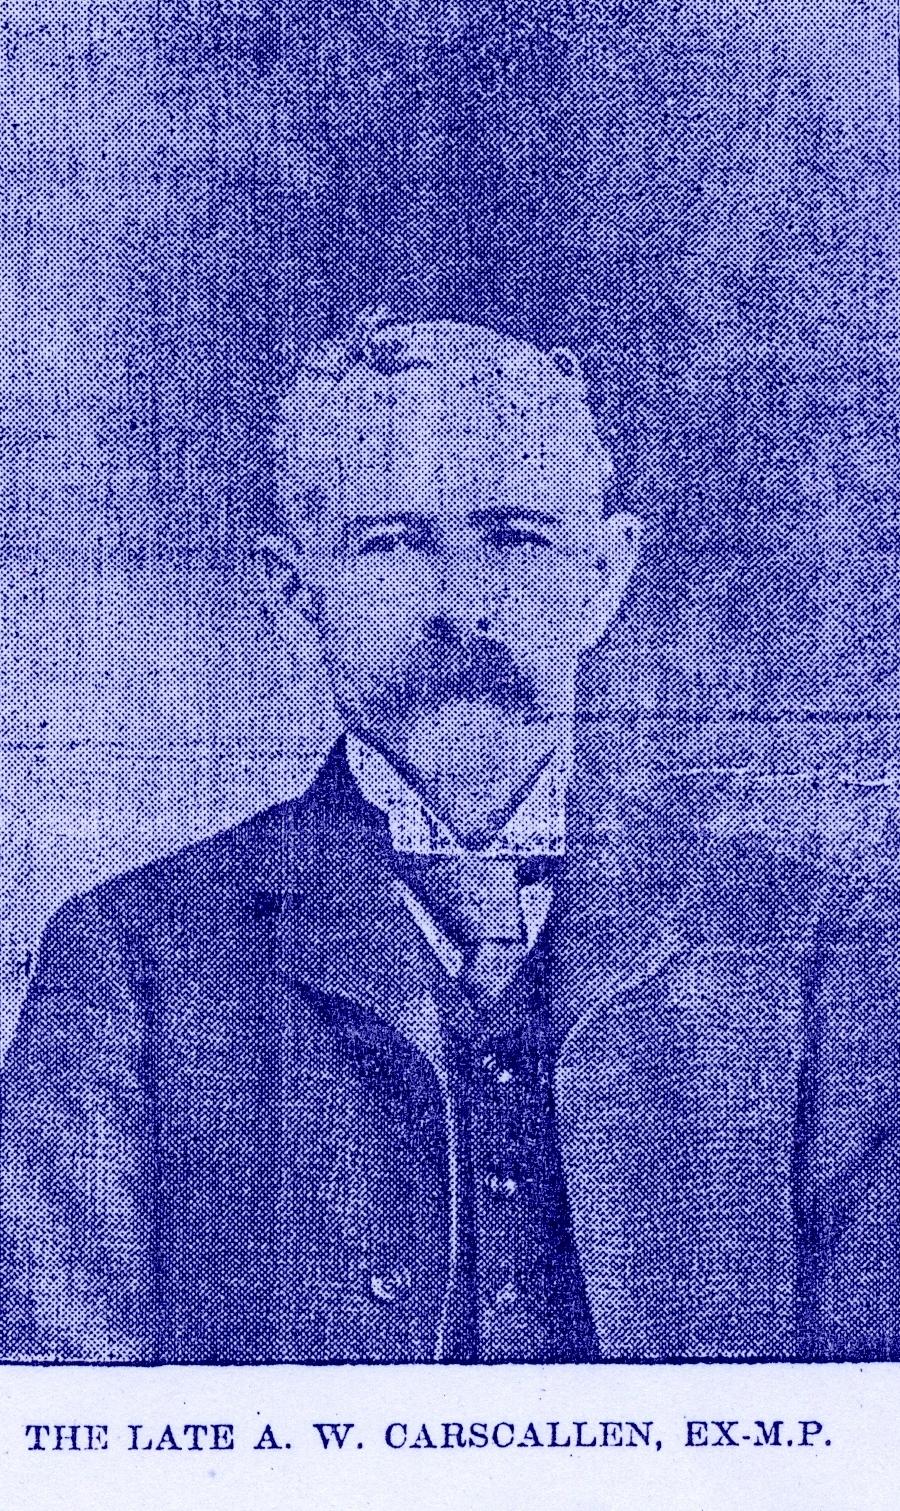 1844-1907